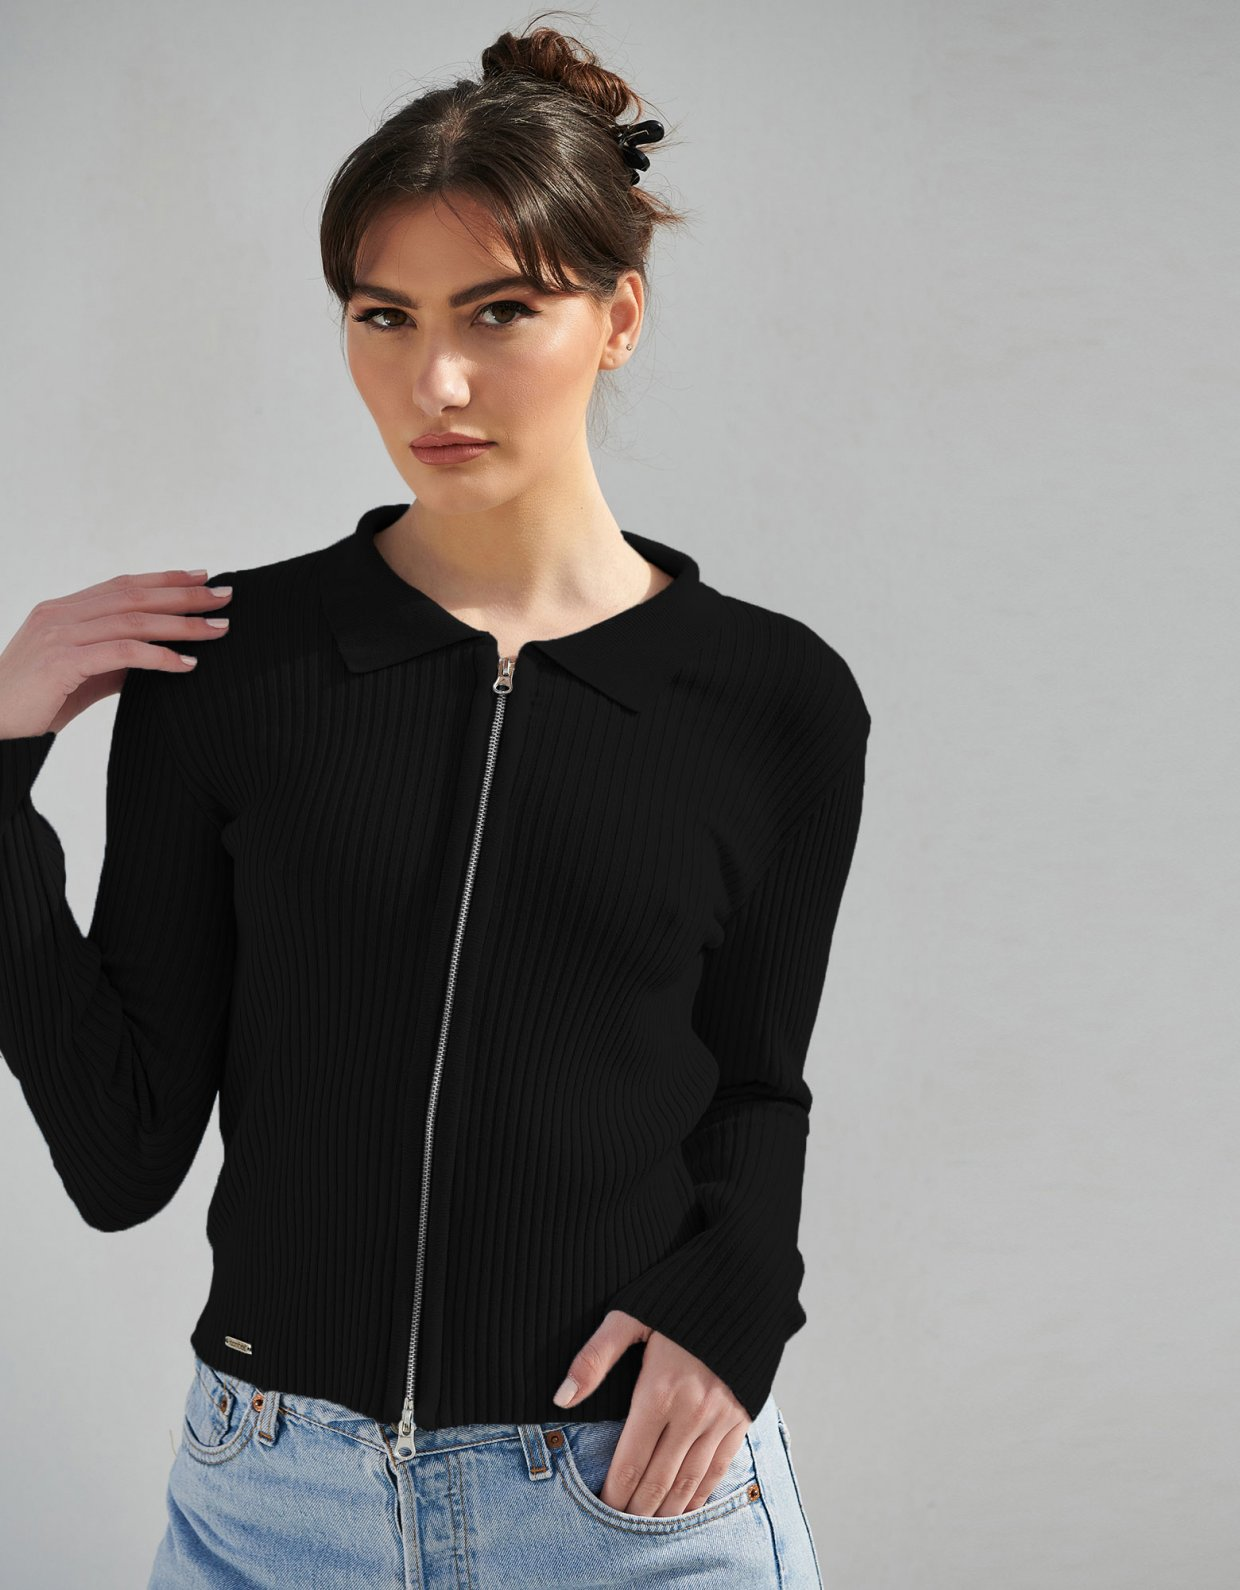 Combos Knitwear Combos S8 – Black polo cardigan